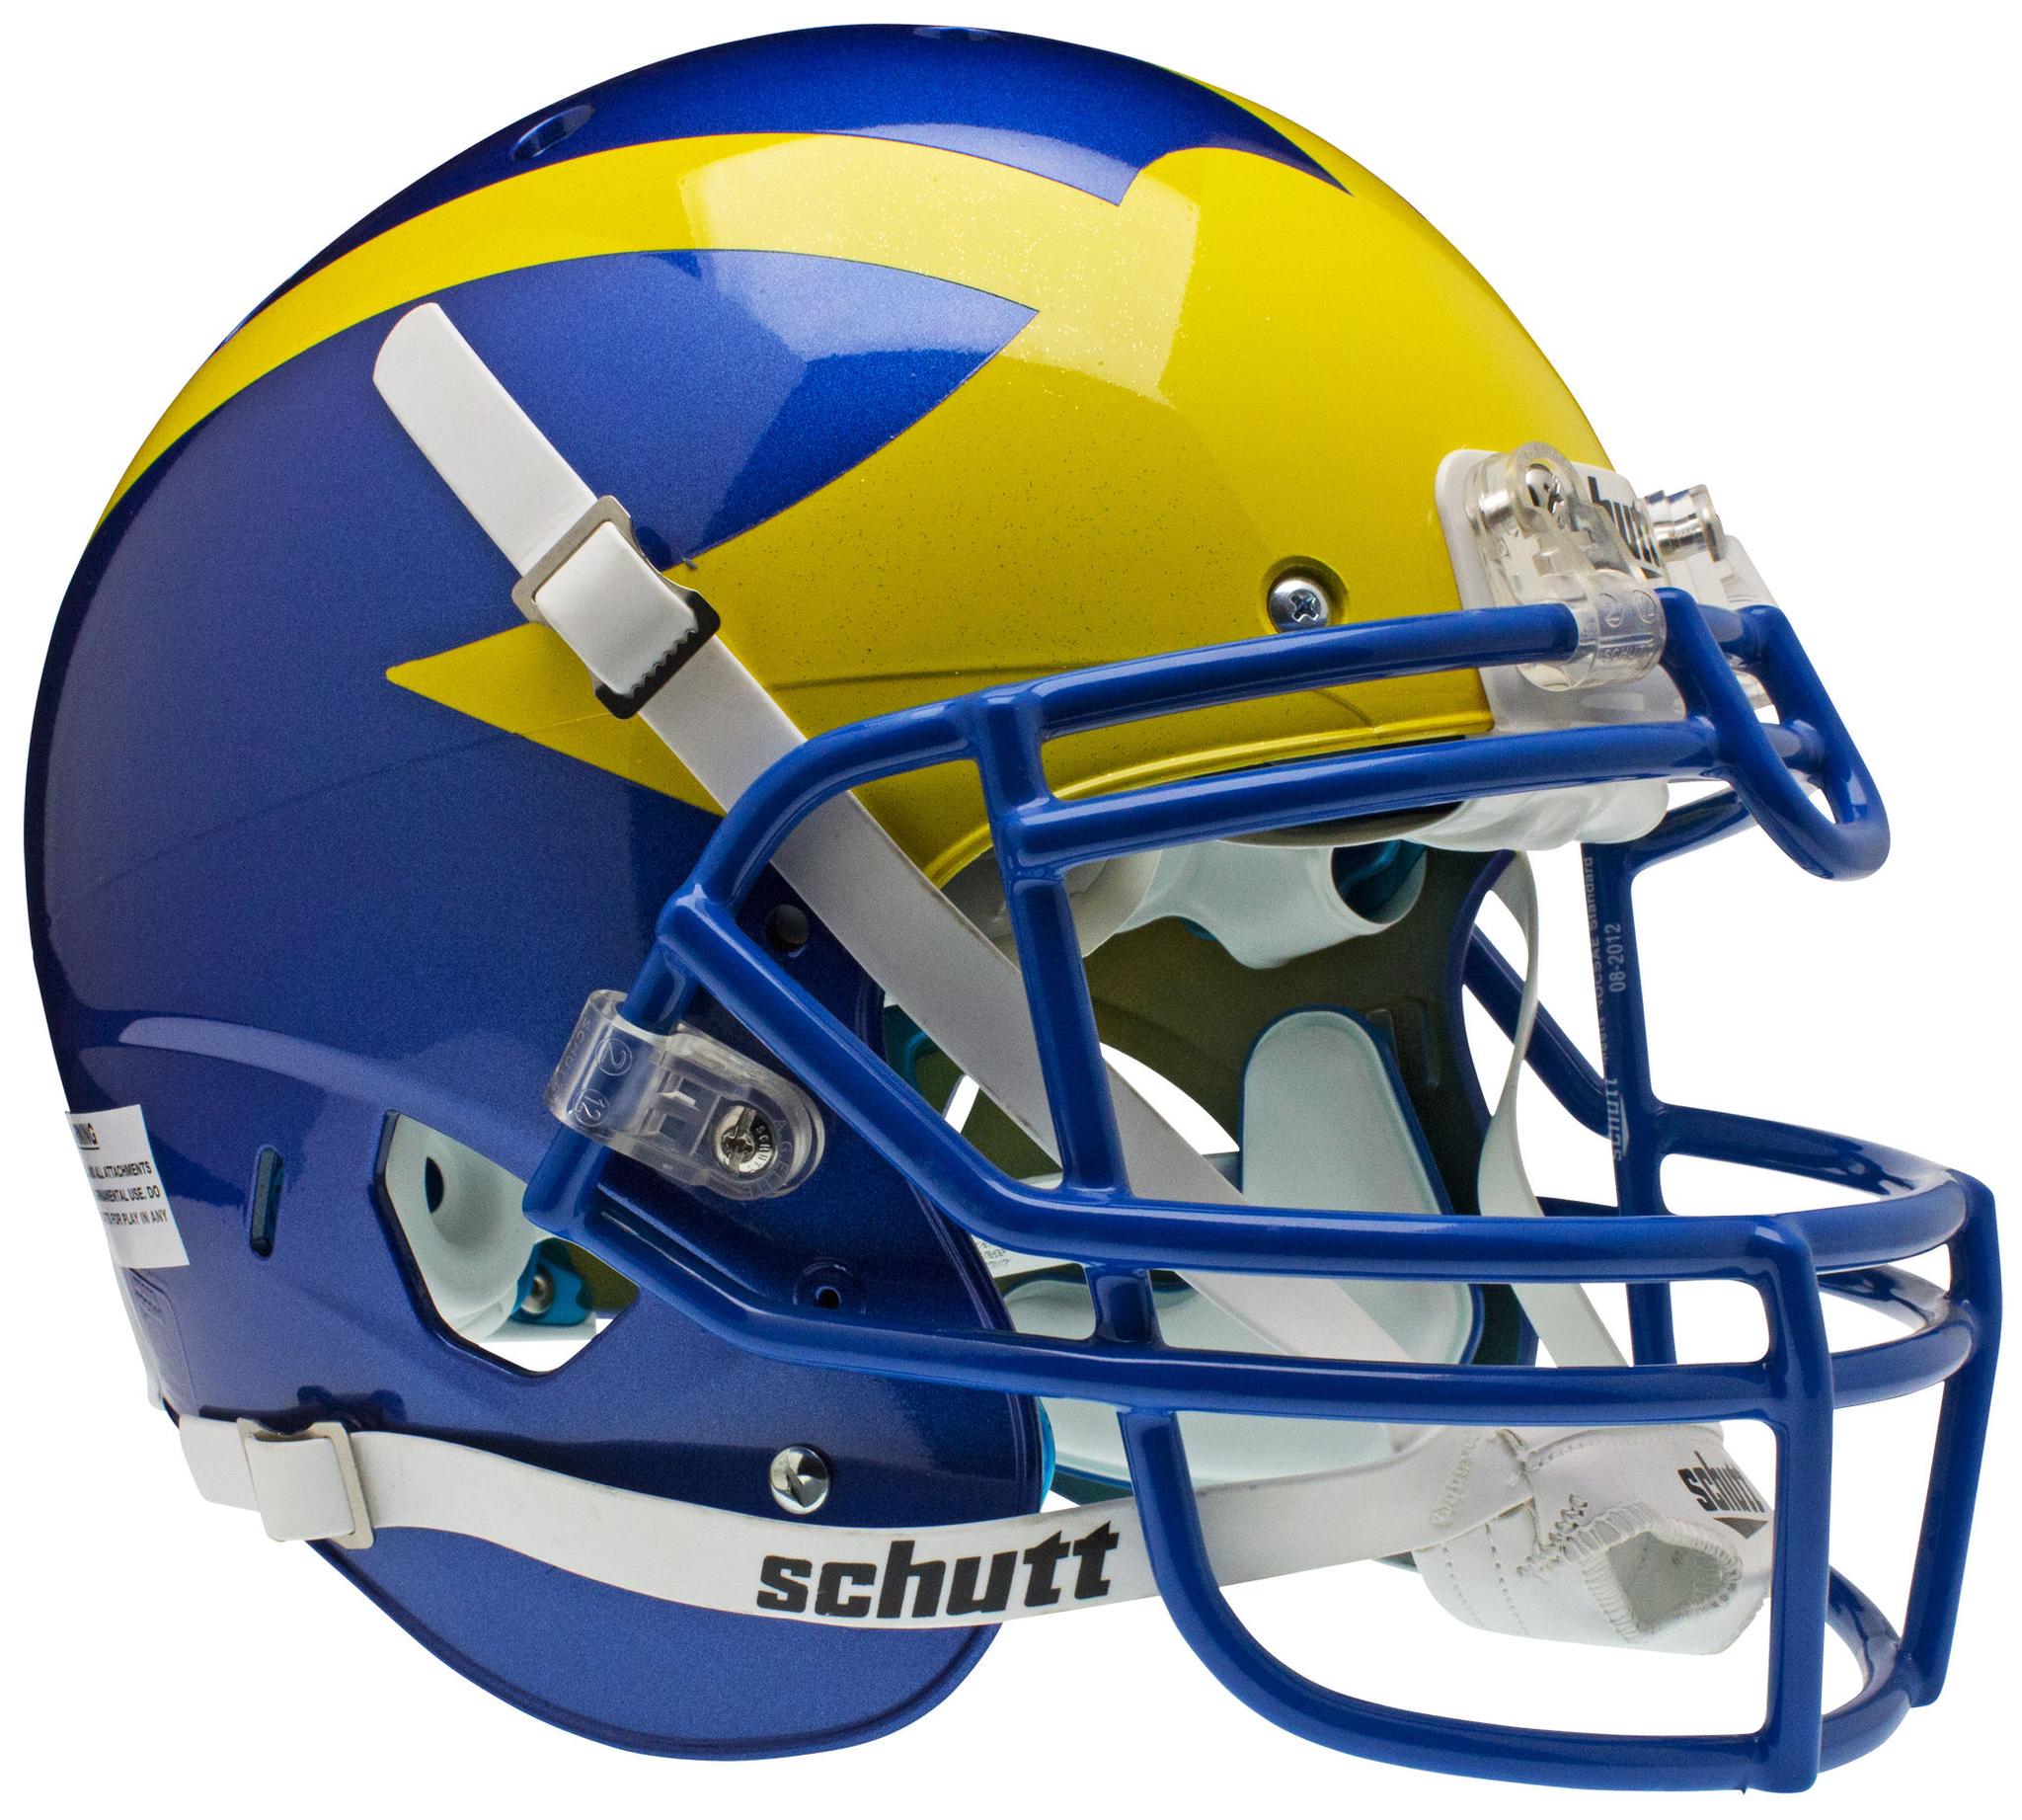 Delaware Blue Hens Authentic College Xp Football Helmet Schutt Football Helmets Delaware Blue Hens College Football Helmets